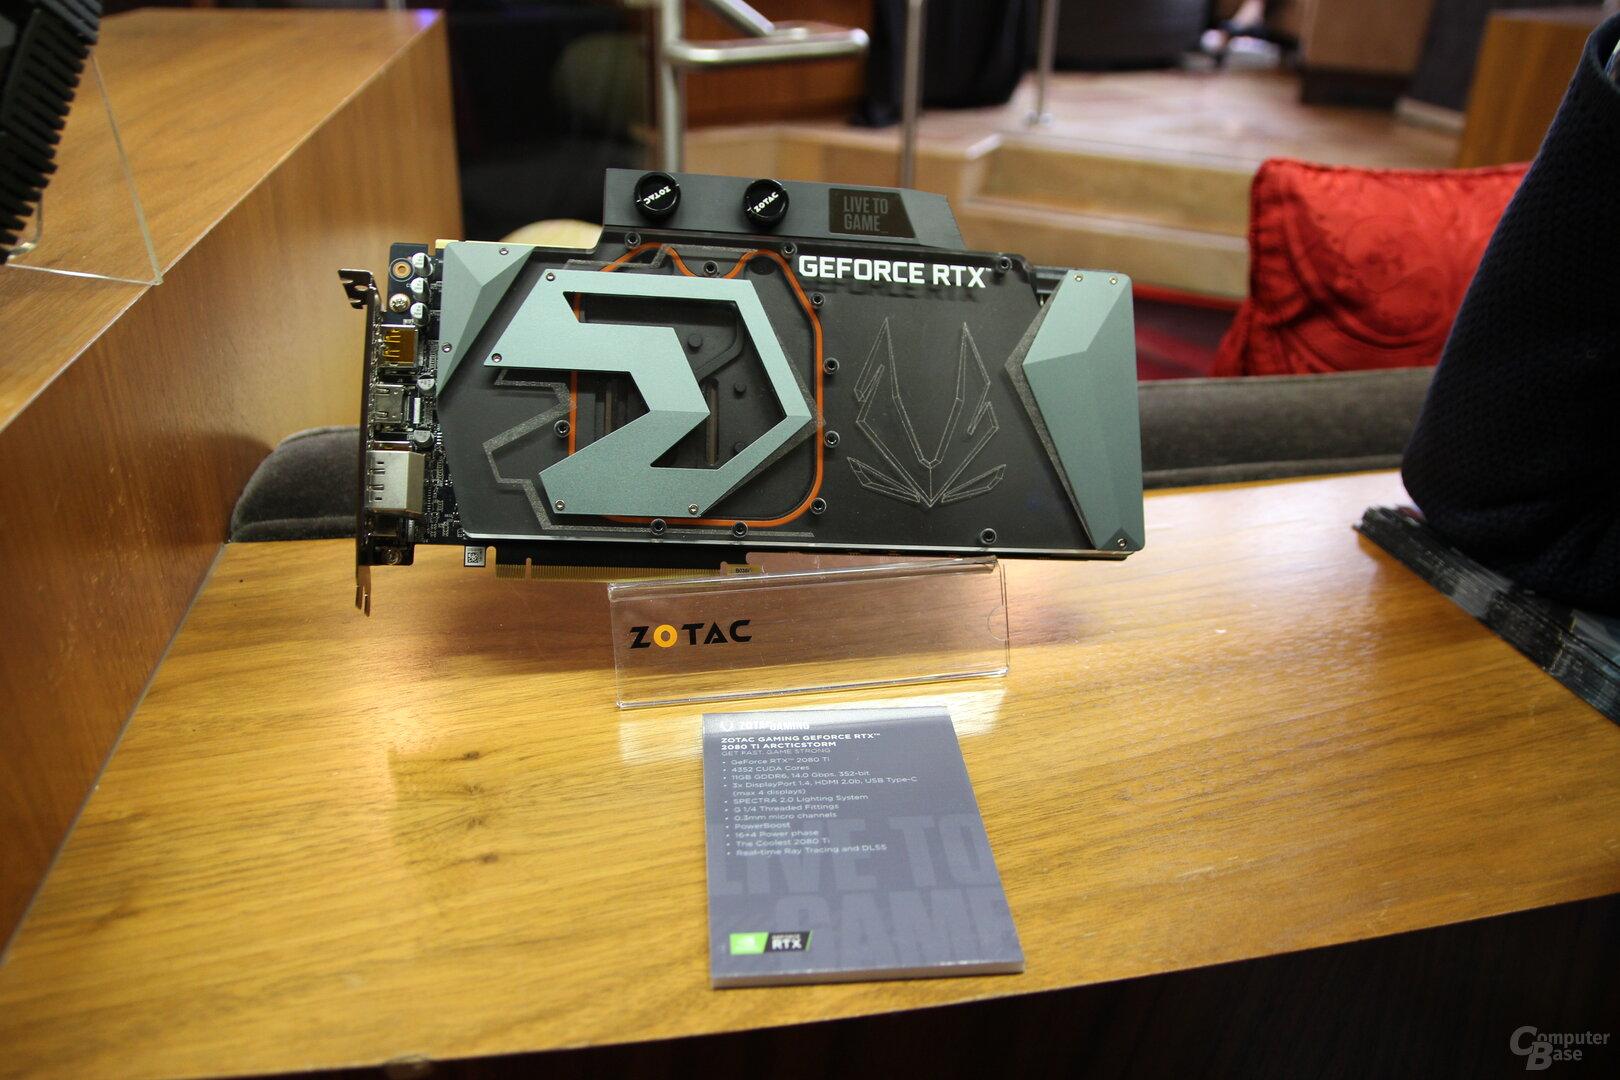 Zotac GeForce RTX 2080 Ti Arctic Storm